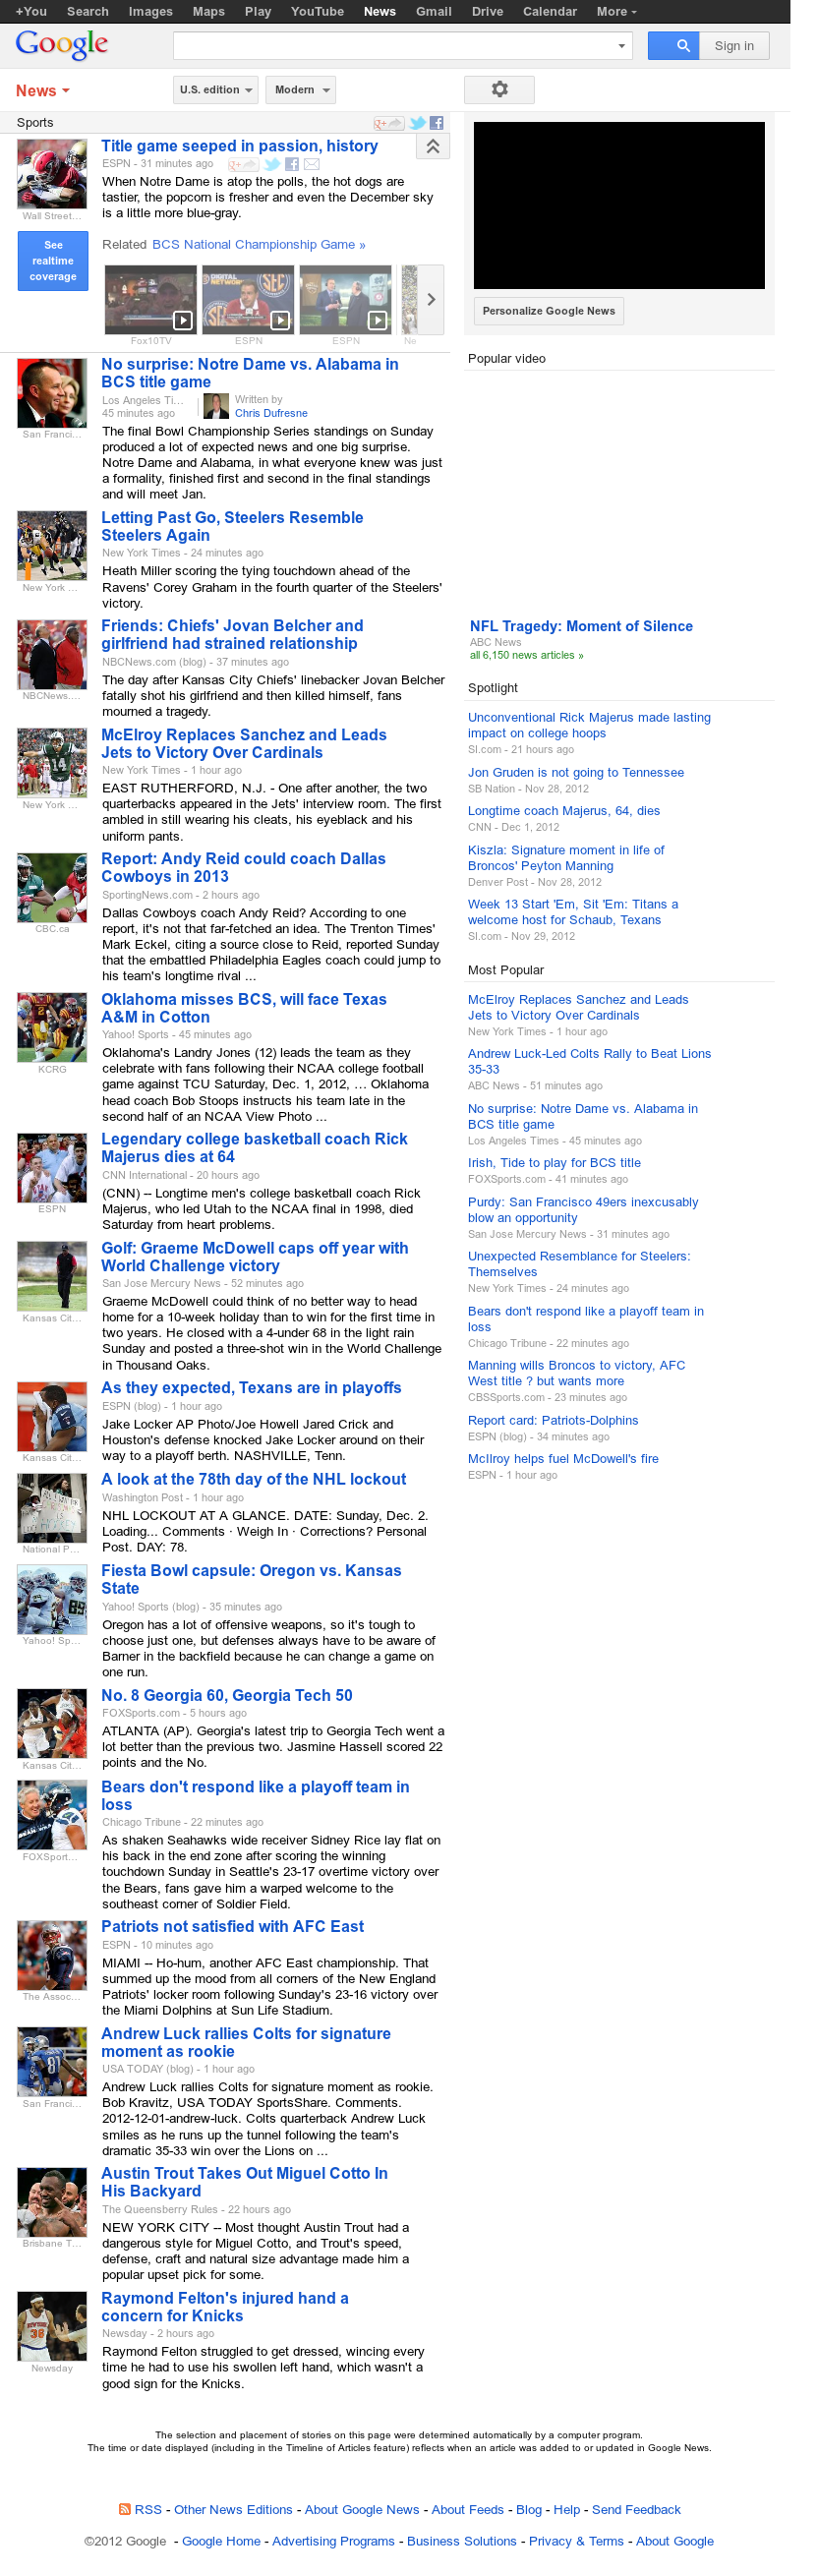 Google News: Sports at Monday Dec. 3, 2012, 3:13 a.m. UTC